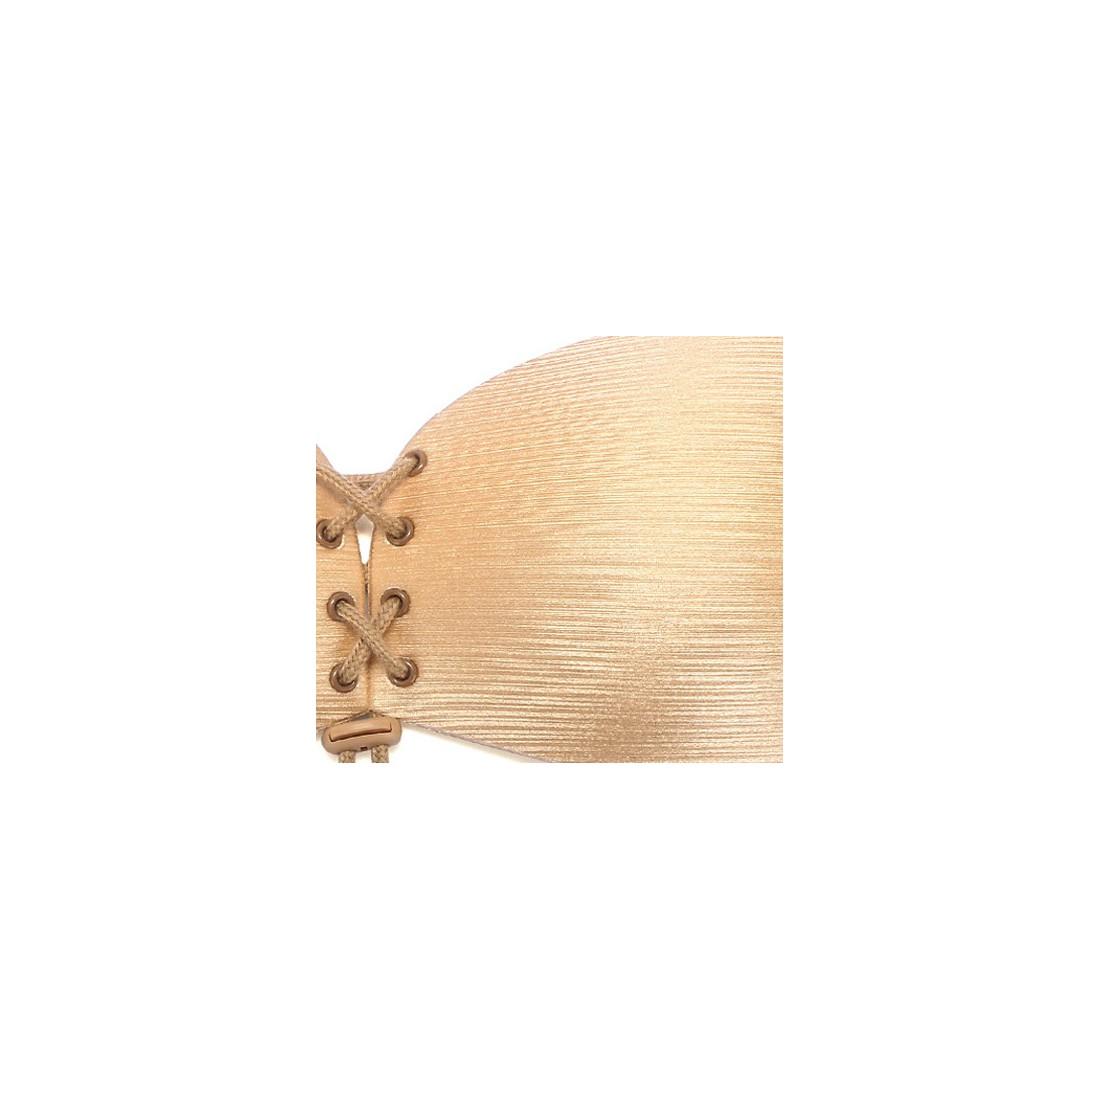 6f684734d7ff5 Luxury Push-Up Stick On Bra - Classic Nude Boost™